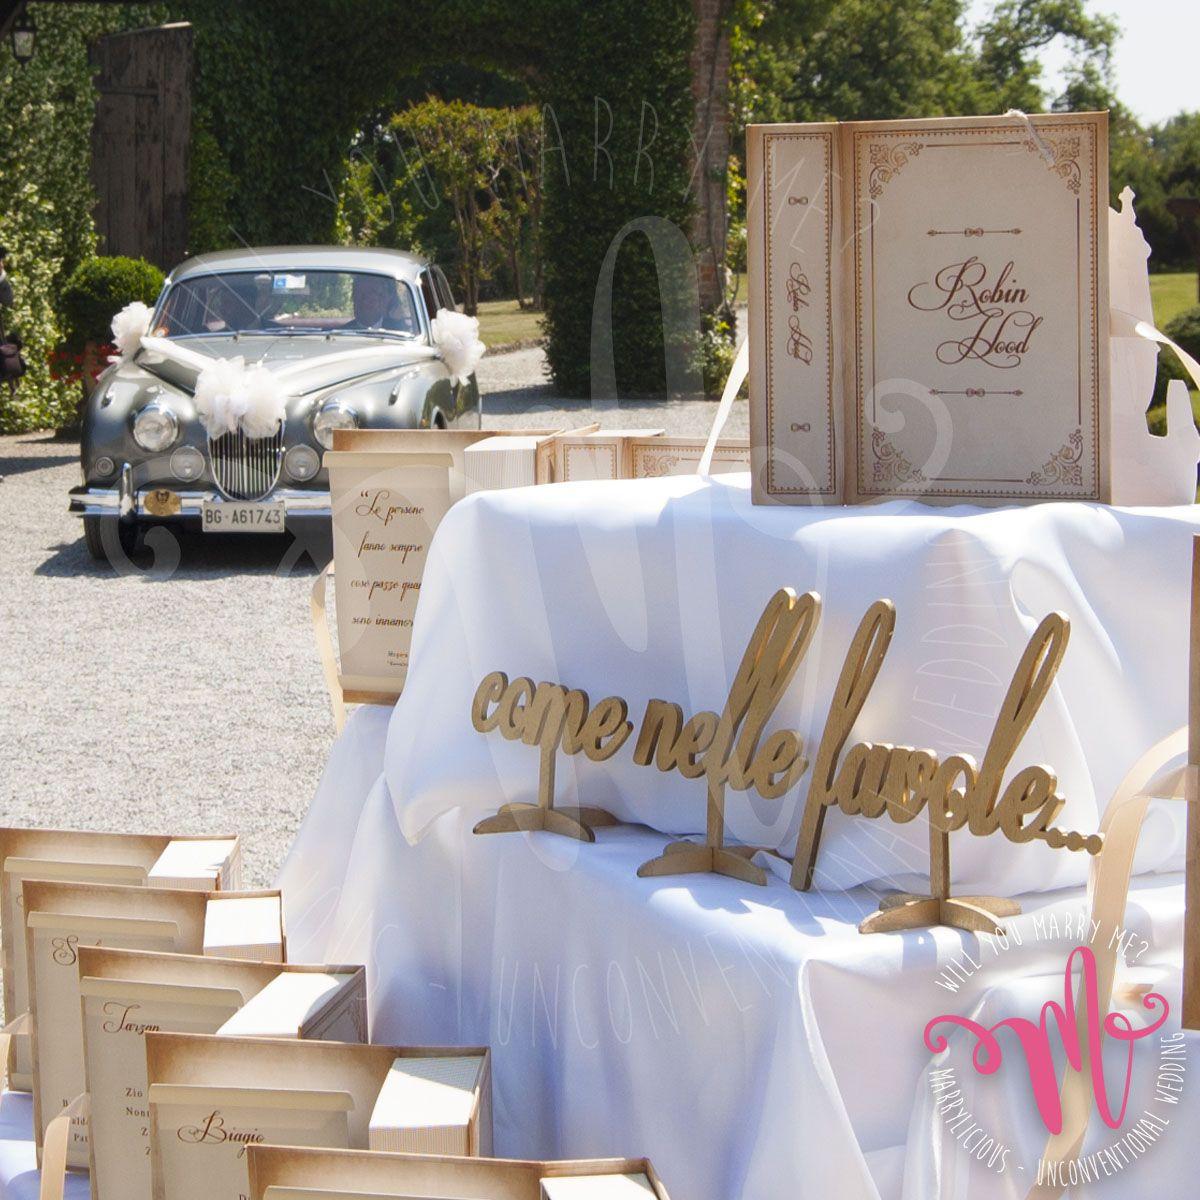 Matrimonio Tema Fotografia : Tableau a tema disney matrimonio disney come nelle favole